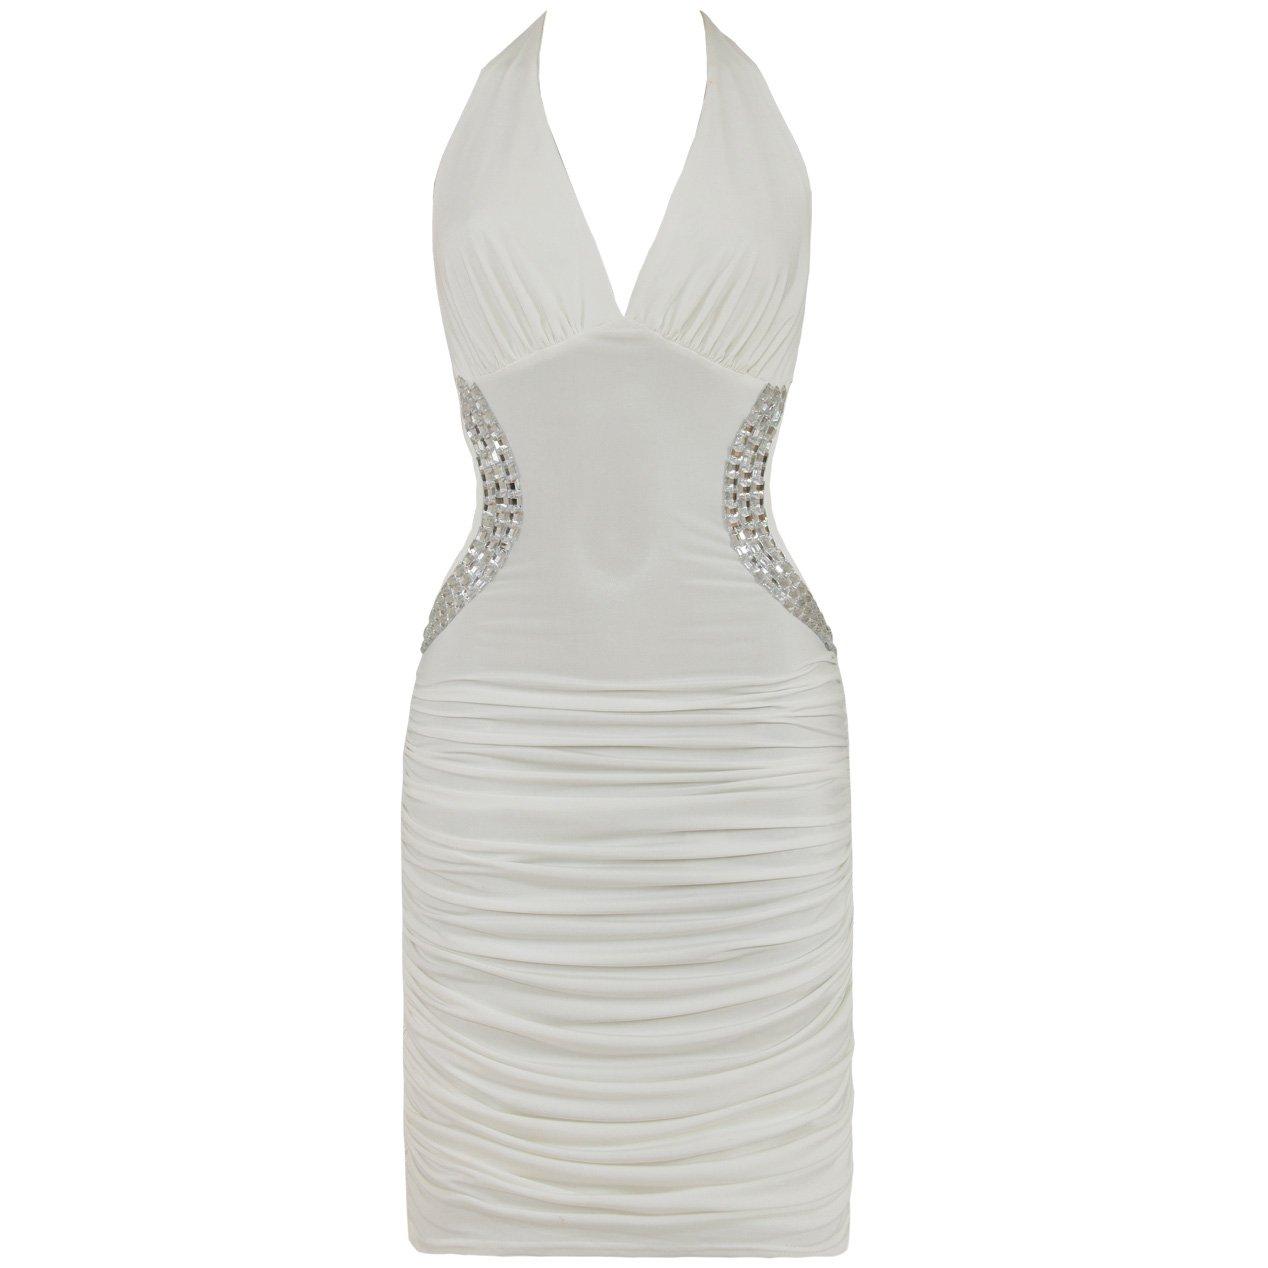 WHITE BACKLESS JEWEL HALTERNECK EVENING MINI CLUBWEAR BODYCON PARTY DRESS UK 8-10, US 4-6